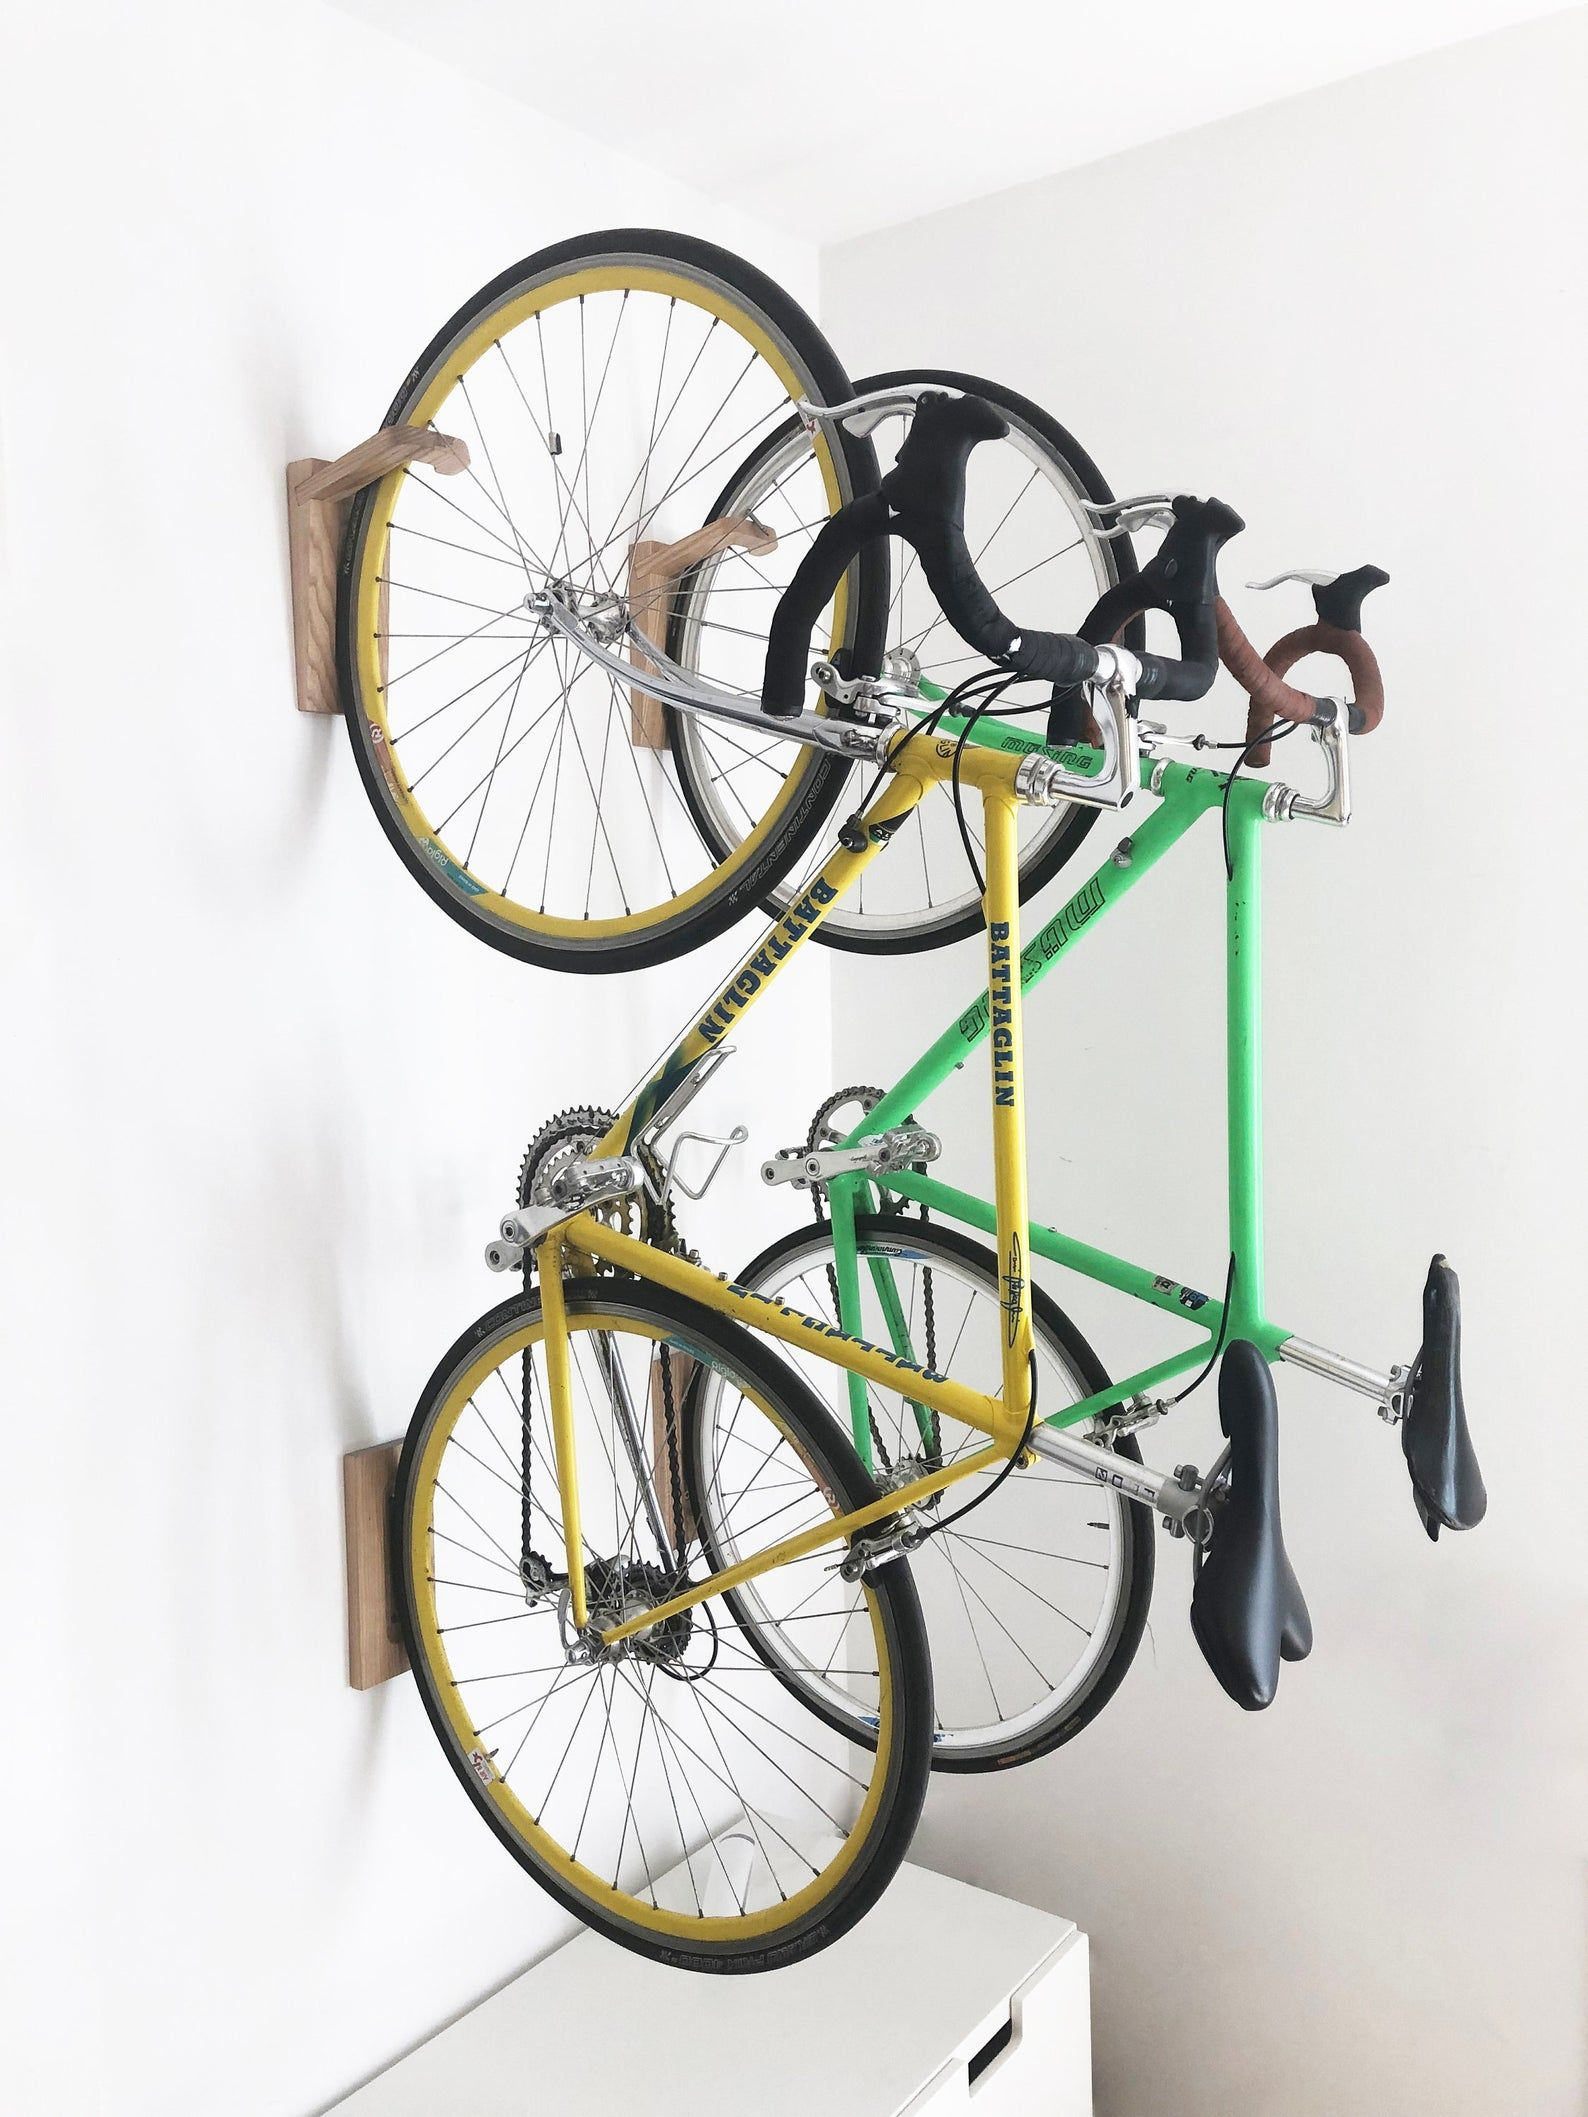 Tokyo Bike Rack Wall Mount Wooden Wall Hook Bike Storage Etsy In 2020 Bike Rack Wall Bike Wall Mount Bike Rack